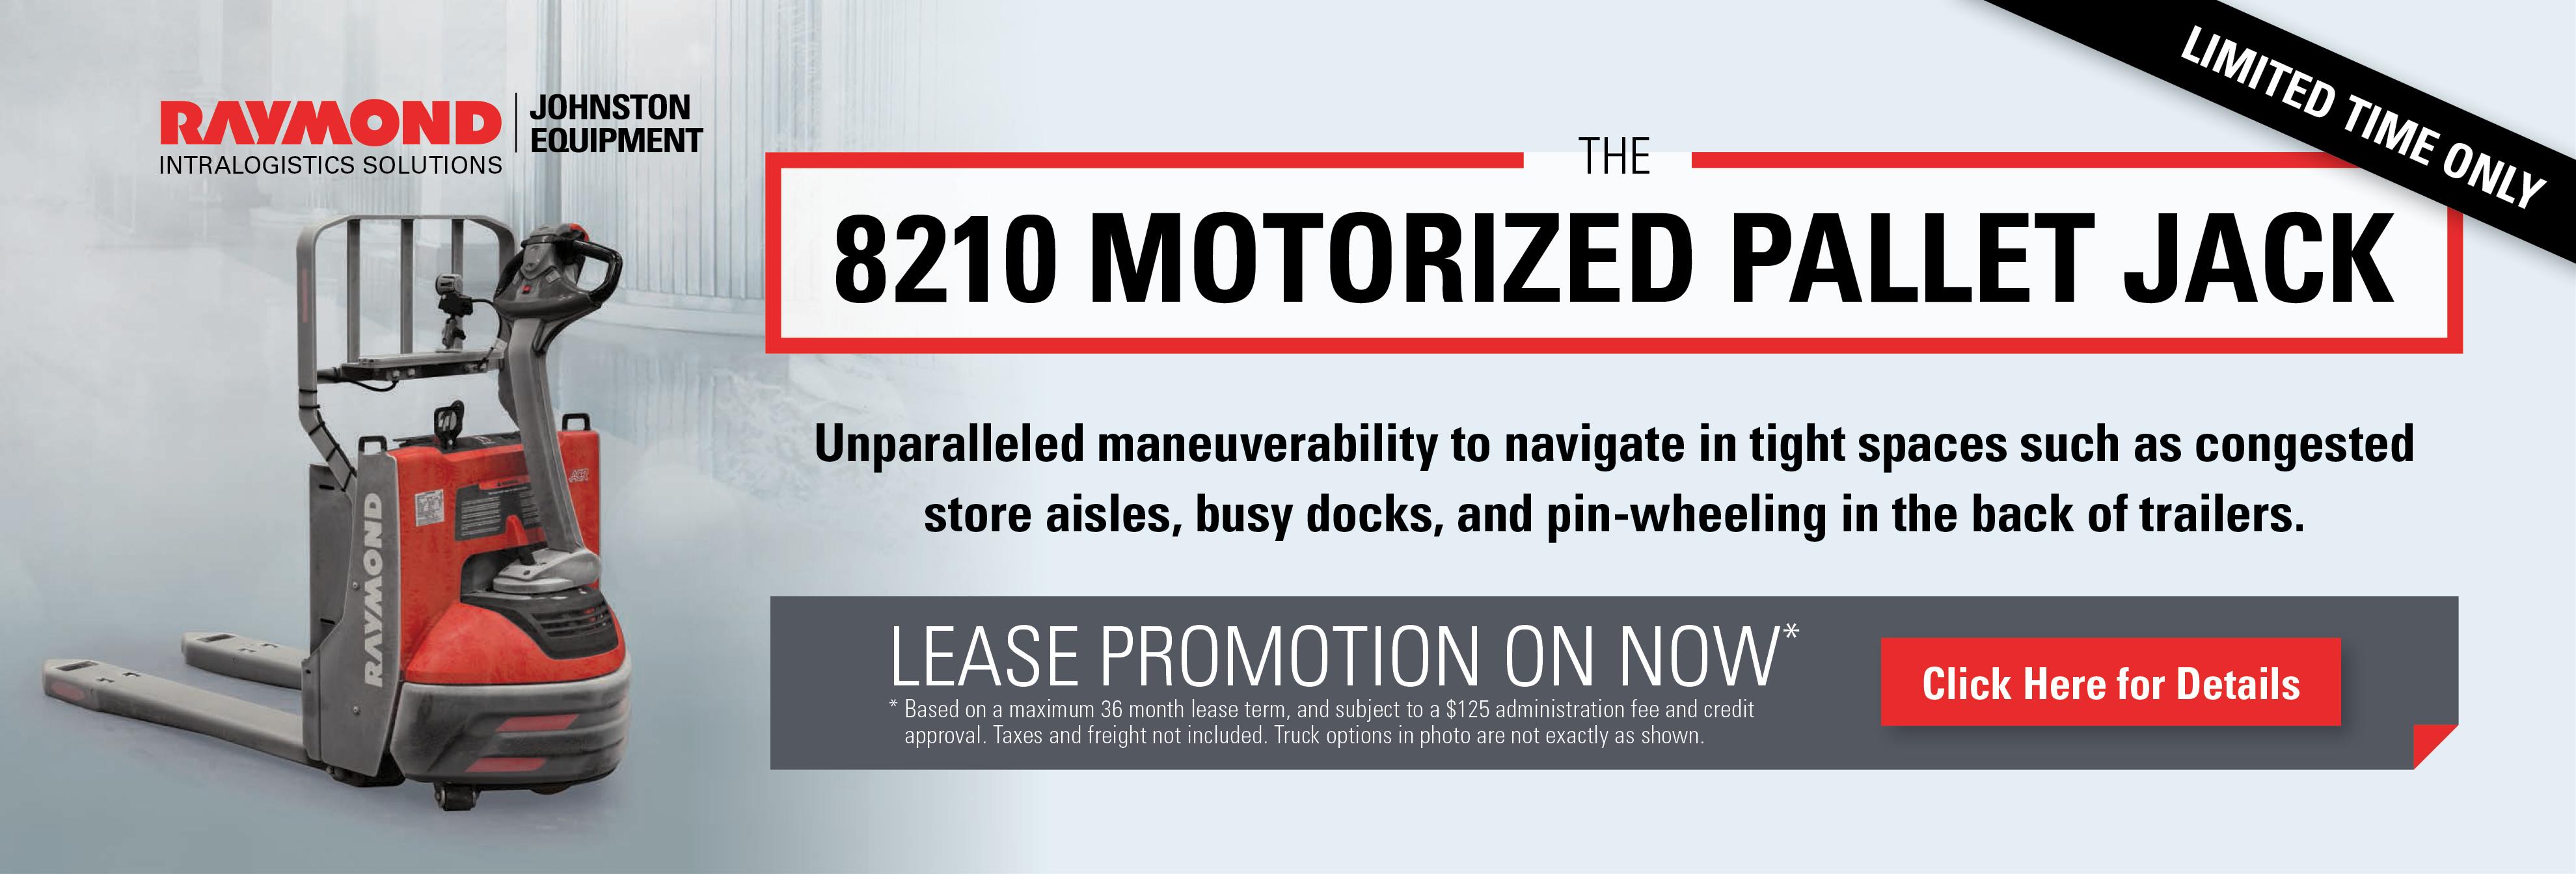 8210 Motorized Pallet Jack Lease Promo